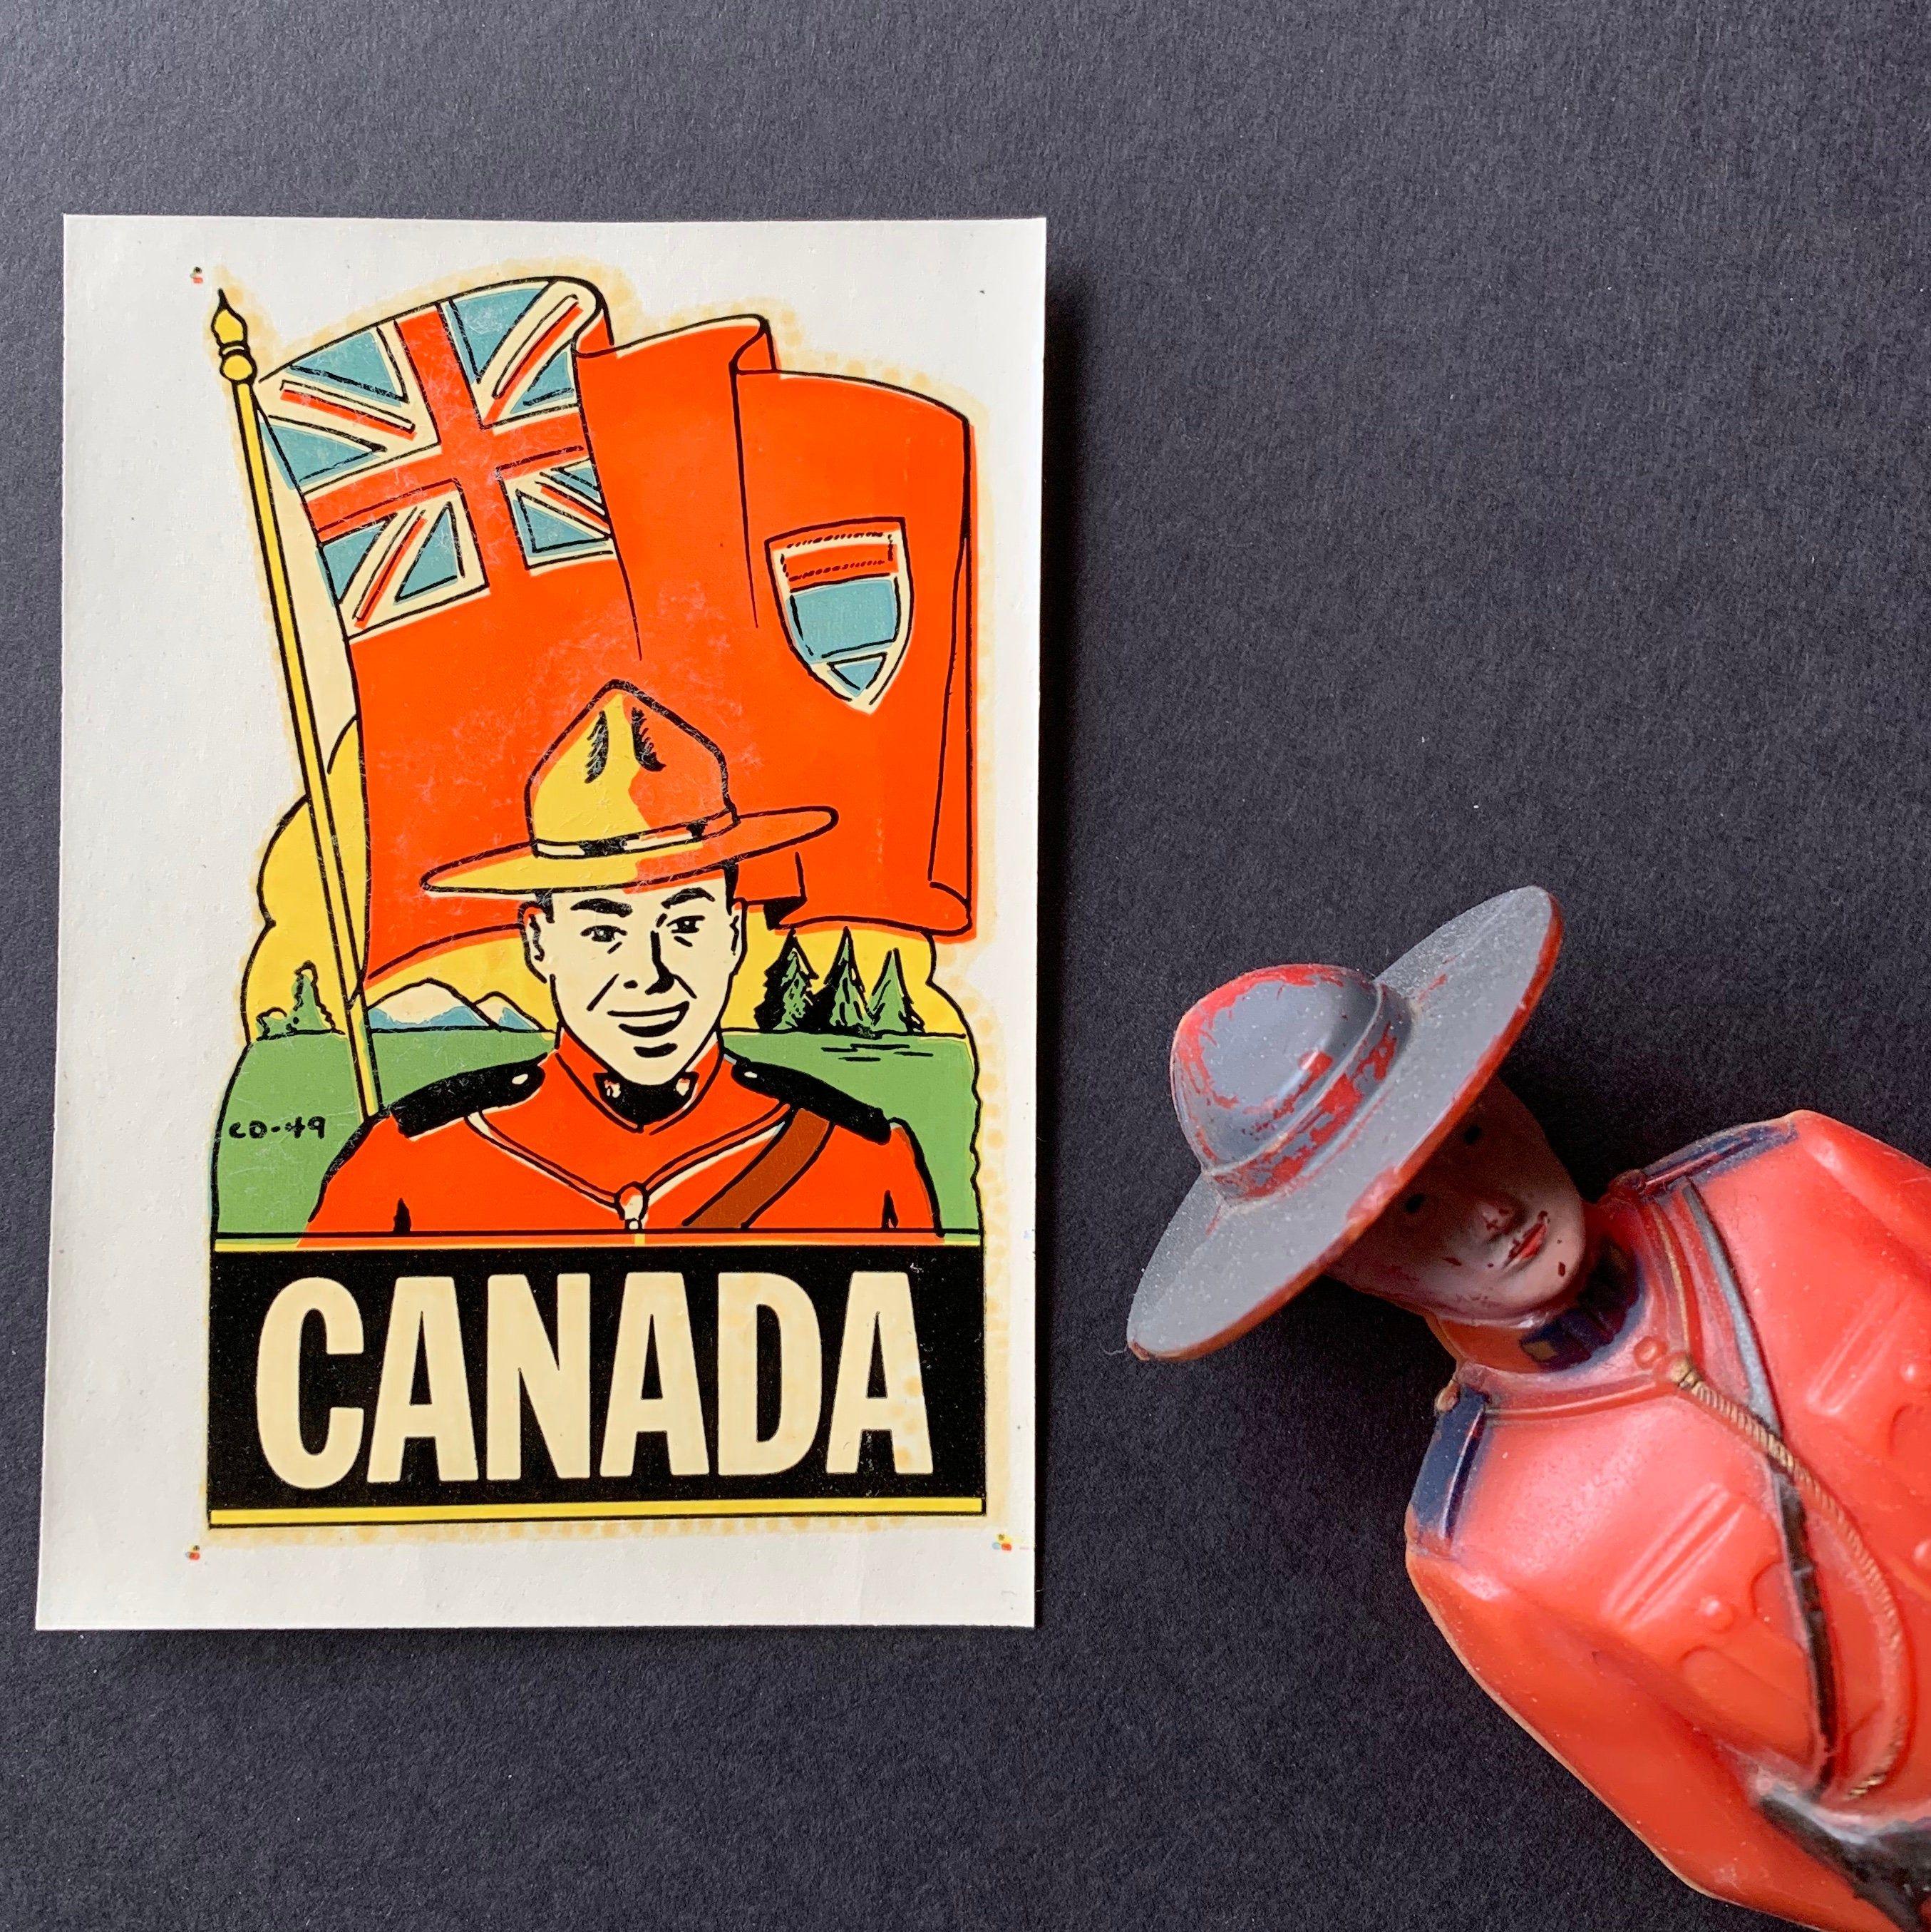 1951 Vintage Canada Mountie Water Decal / 1950s Retro